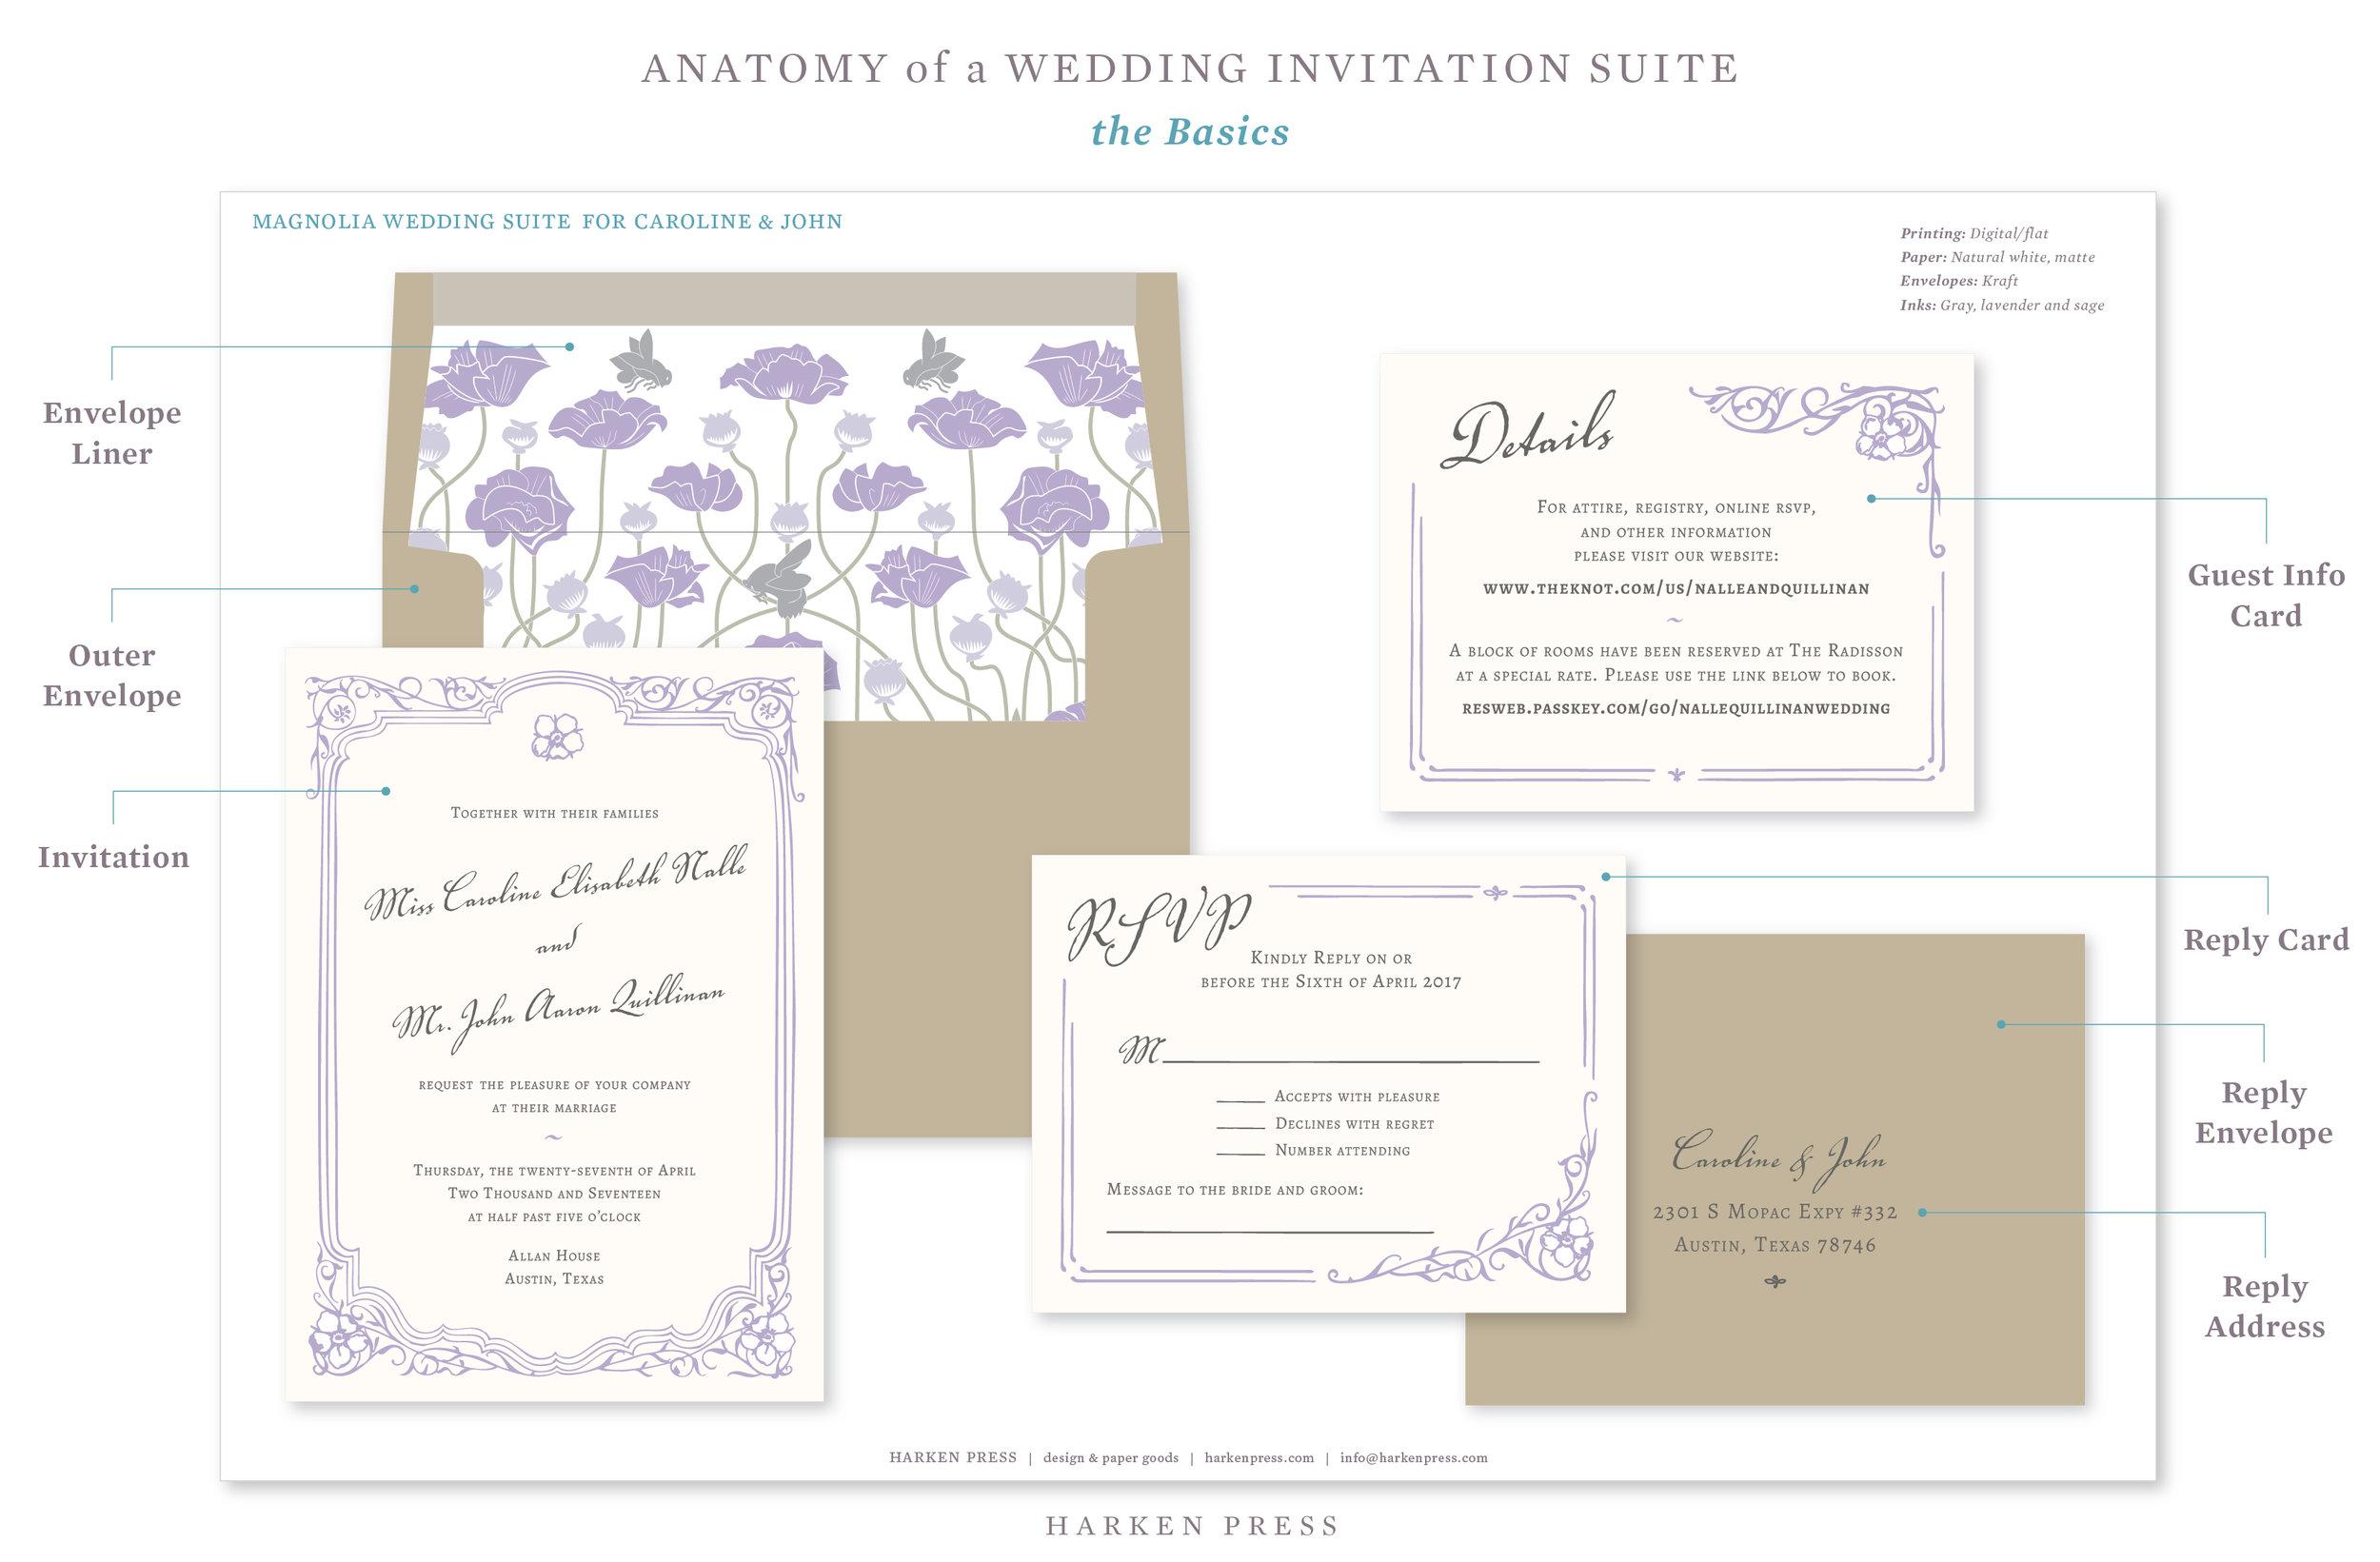 Anatomy Of A Wedding Invitation Suite